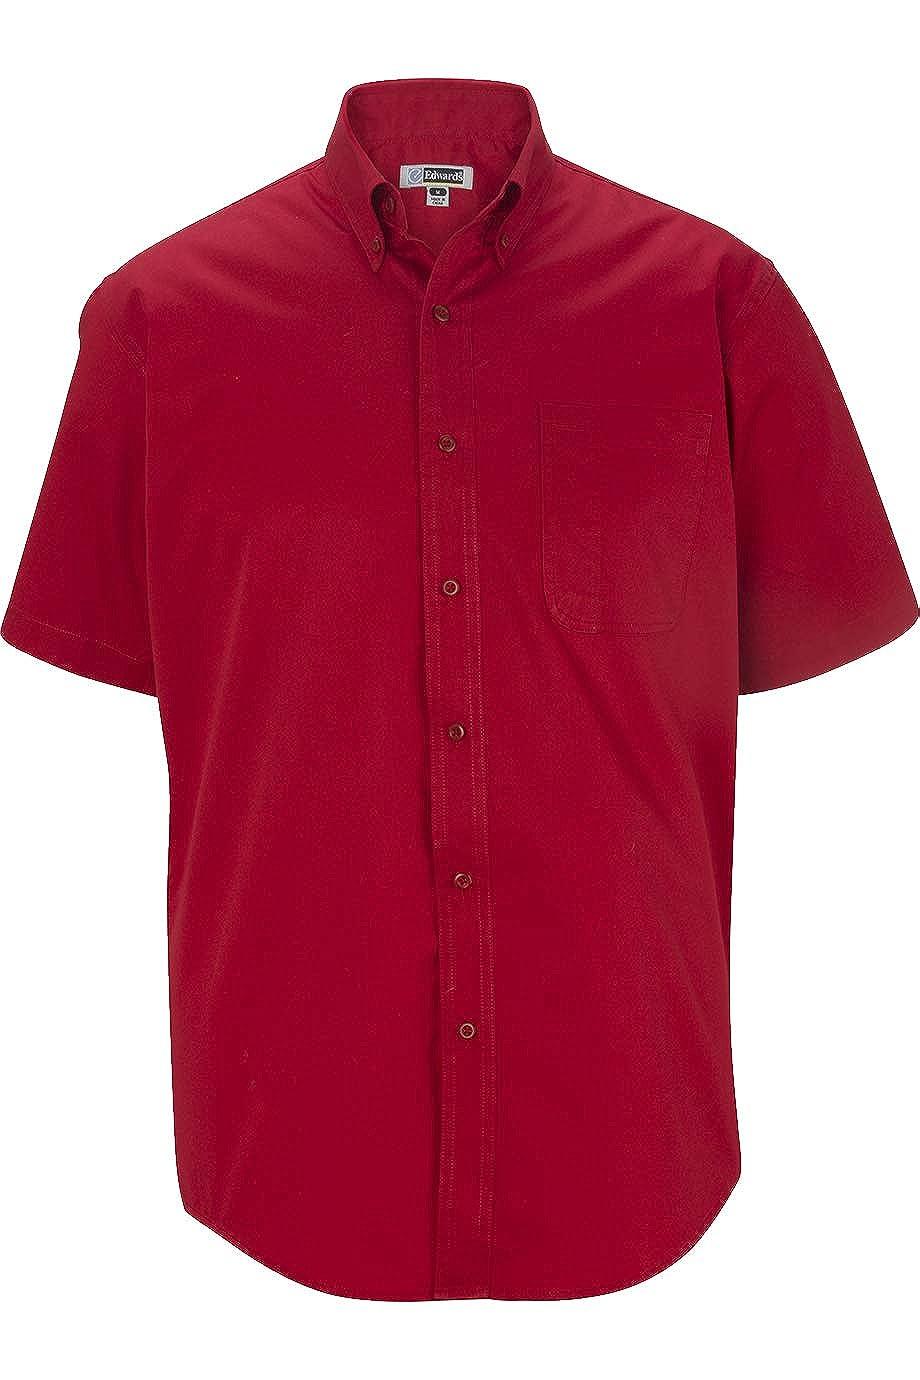 Edwards Mens Cottonplus Short Sleeve Twill Shirt